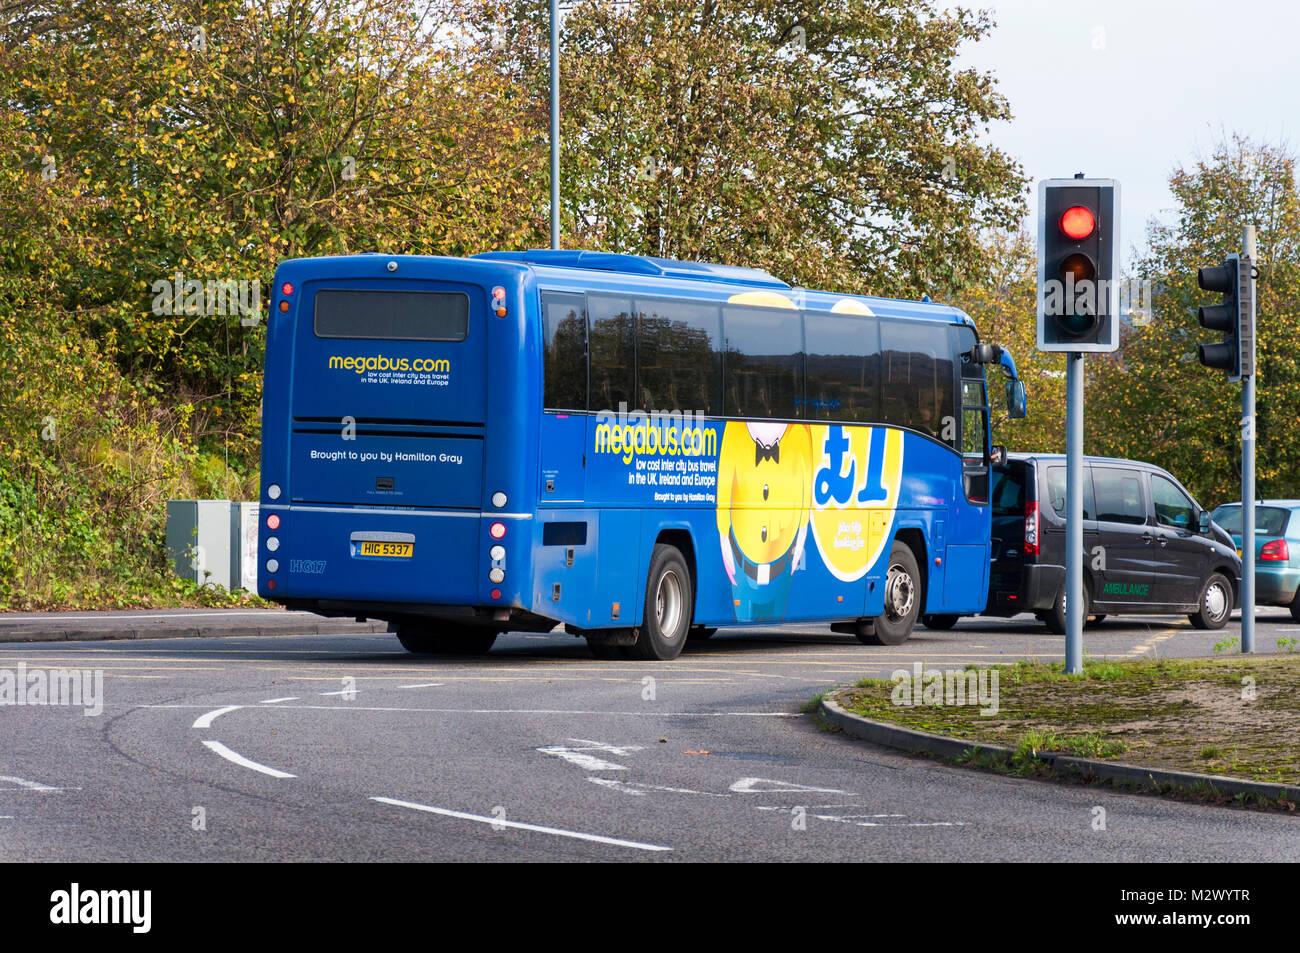 Megabus Stock Photos & Megabus Stock Images - Alamy